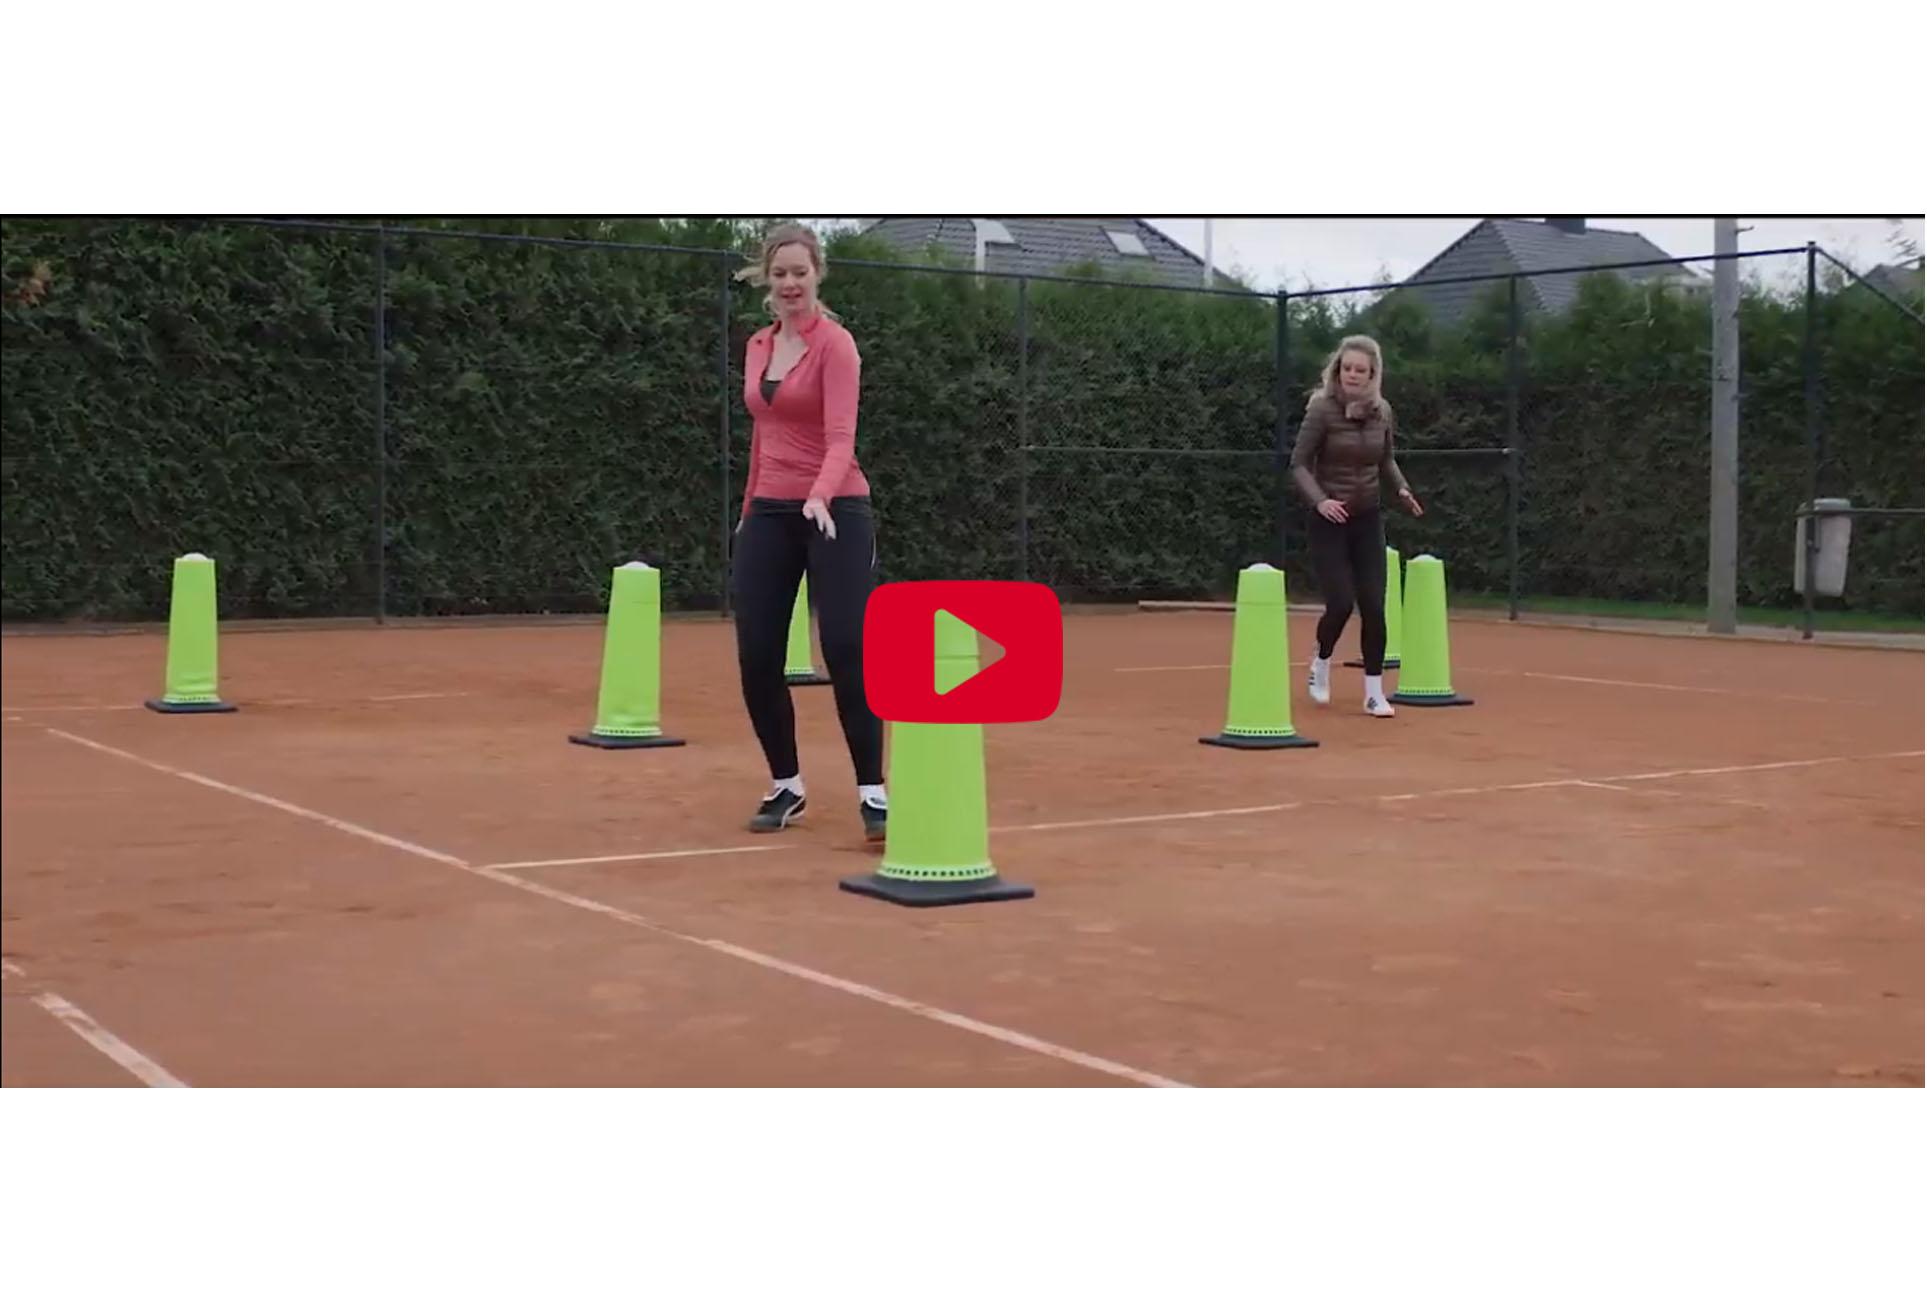 IPS Pylonnen/kegels video